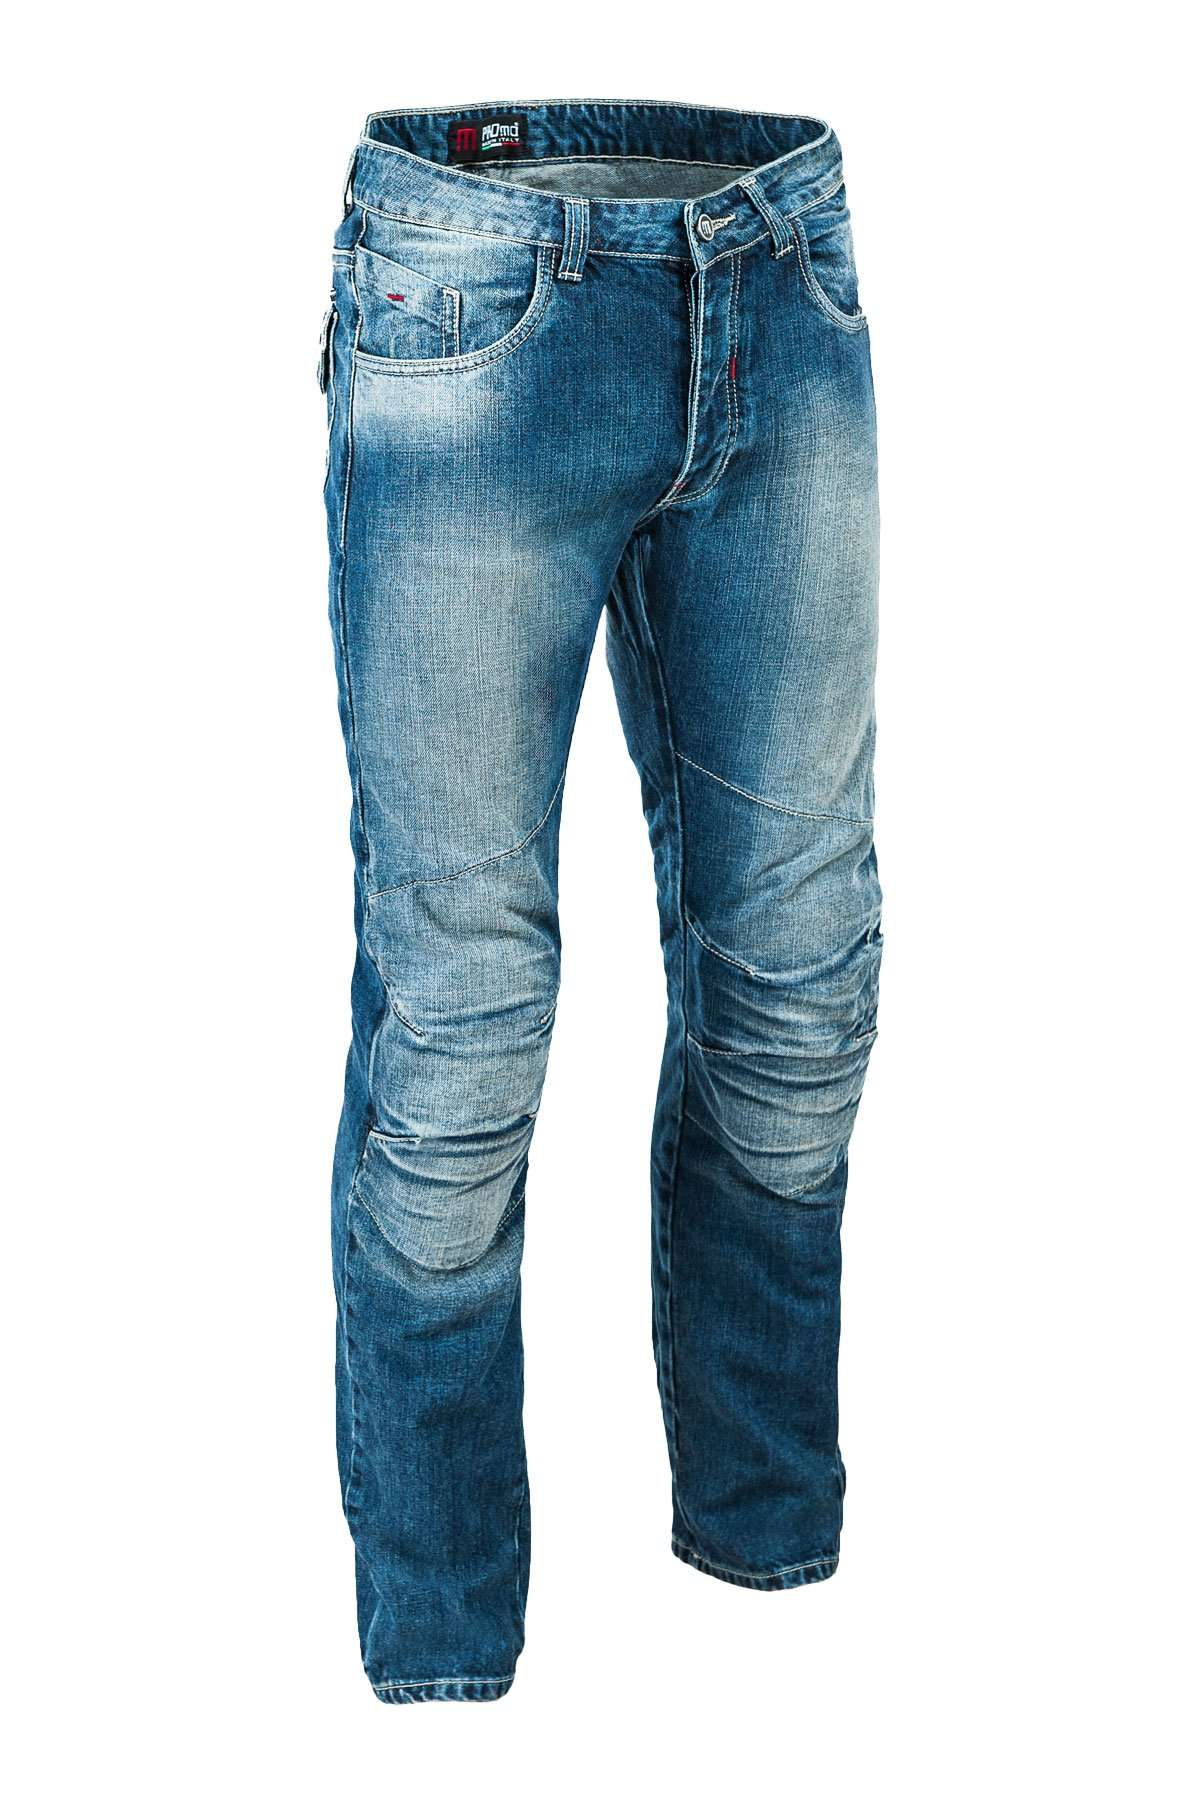 Мотоджинсы Promo Jeans Milano BLue